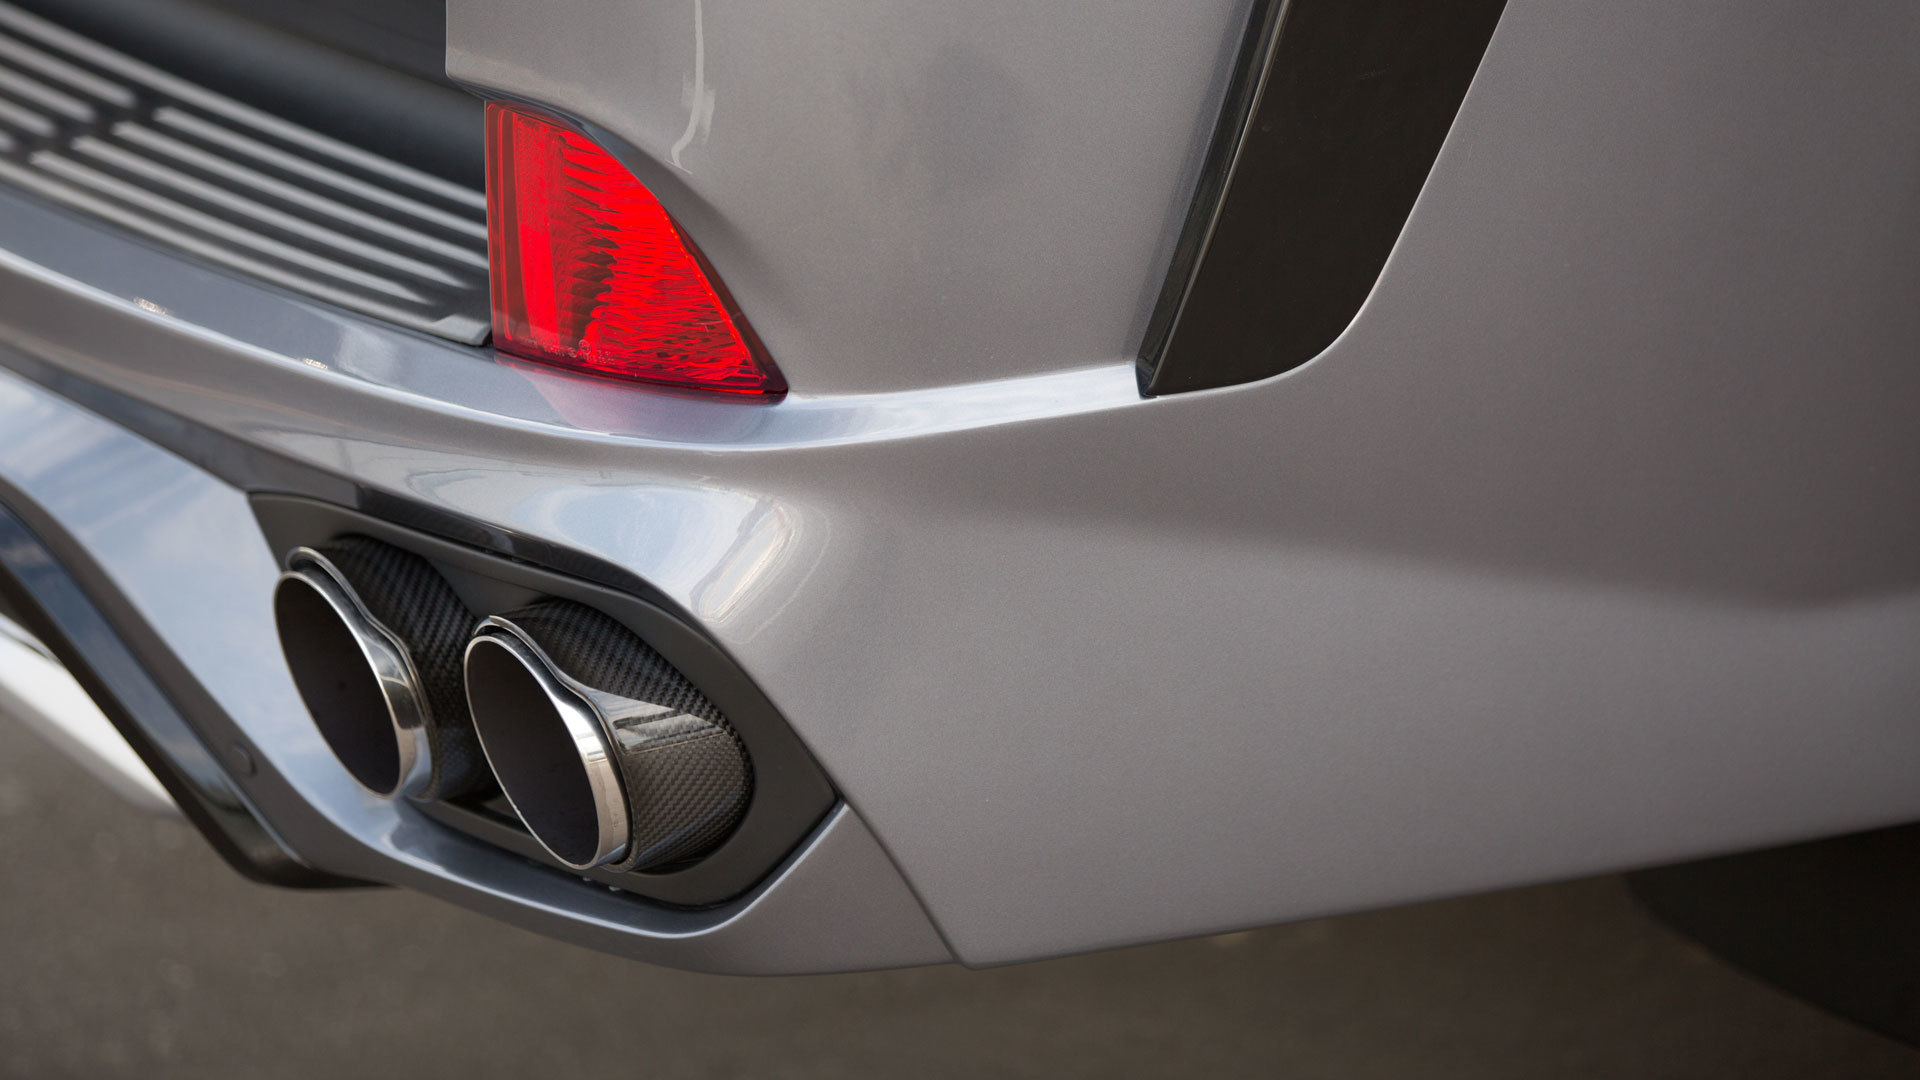 MTR Design Body kit for Lexus LX 570 new style